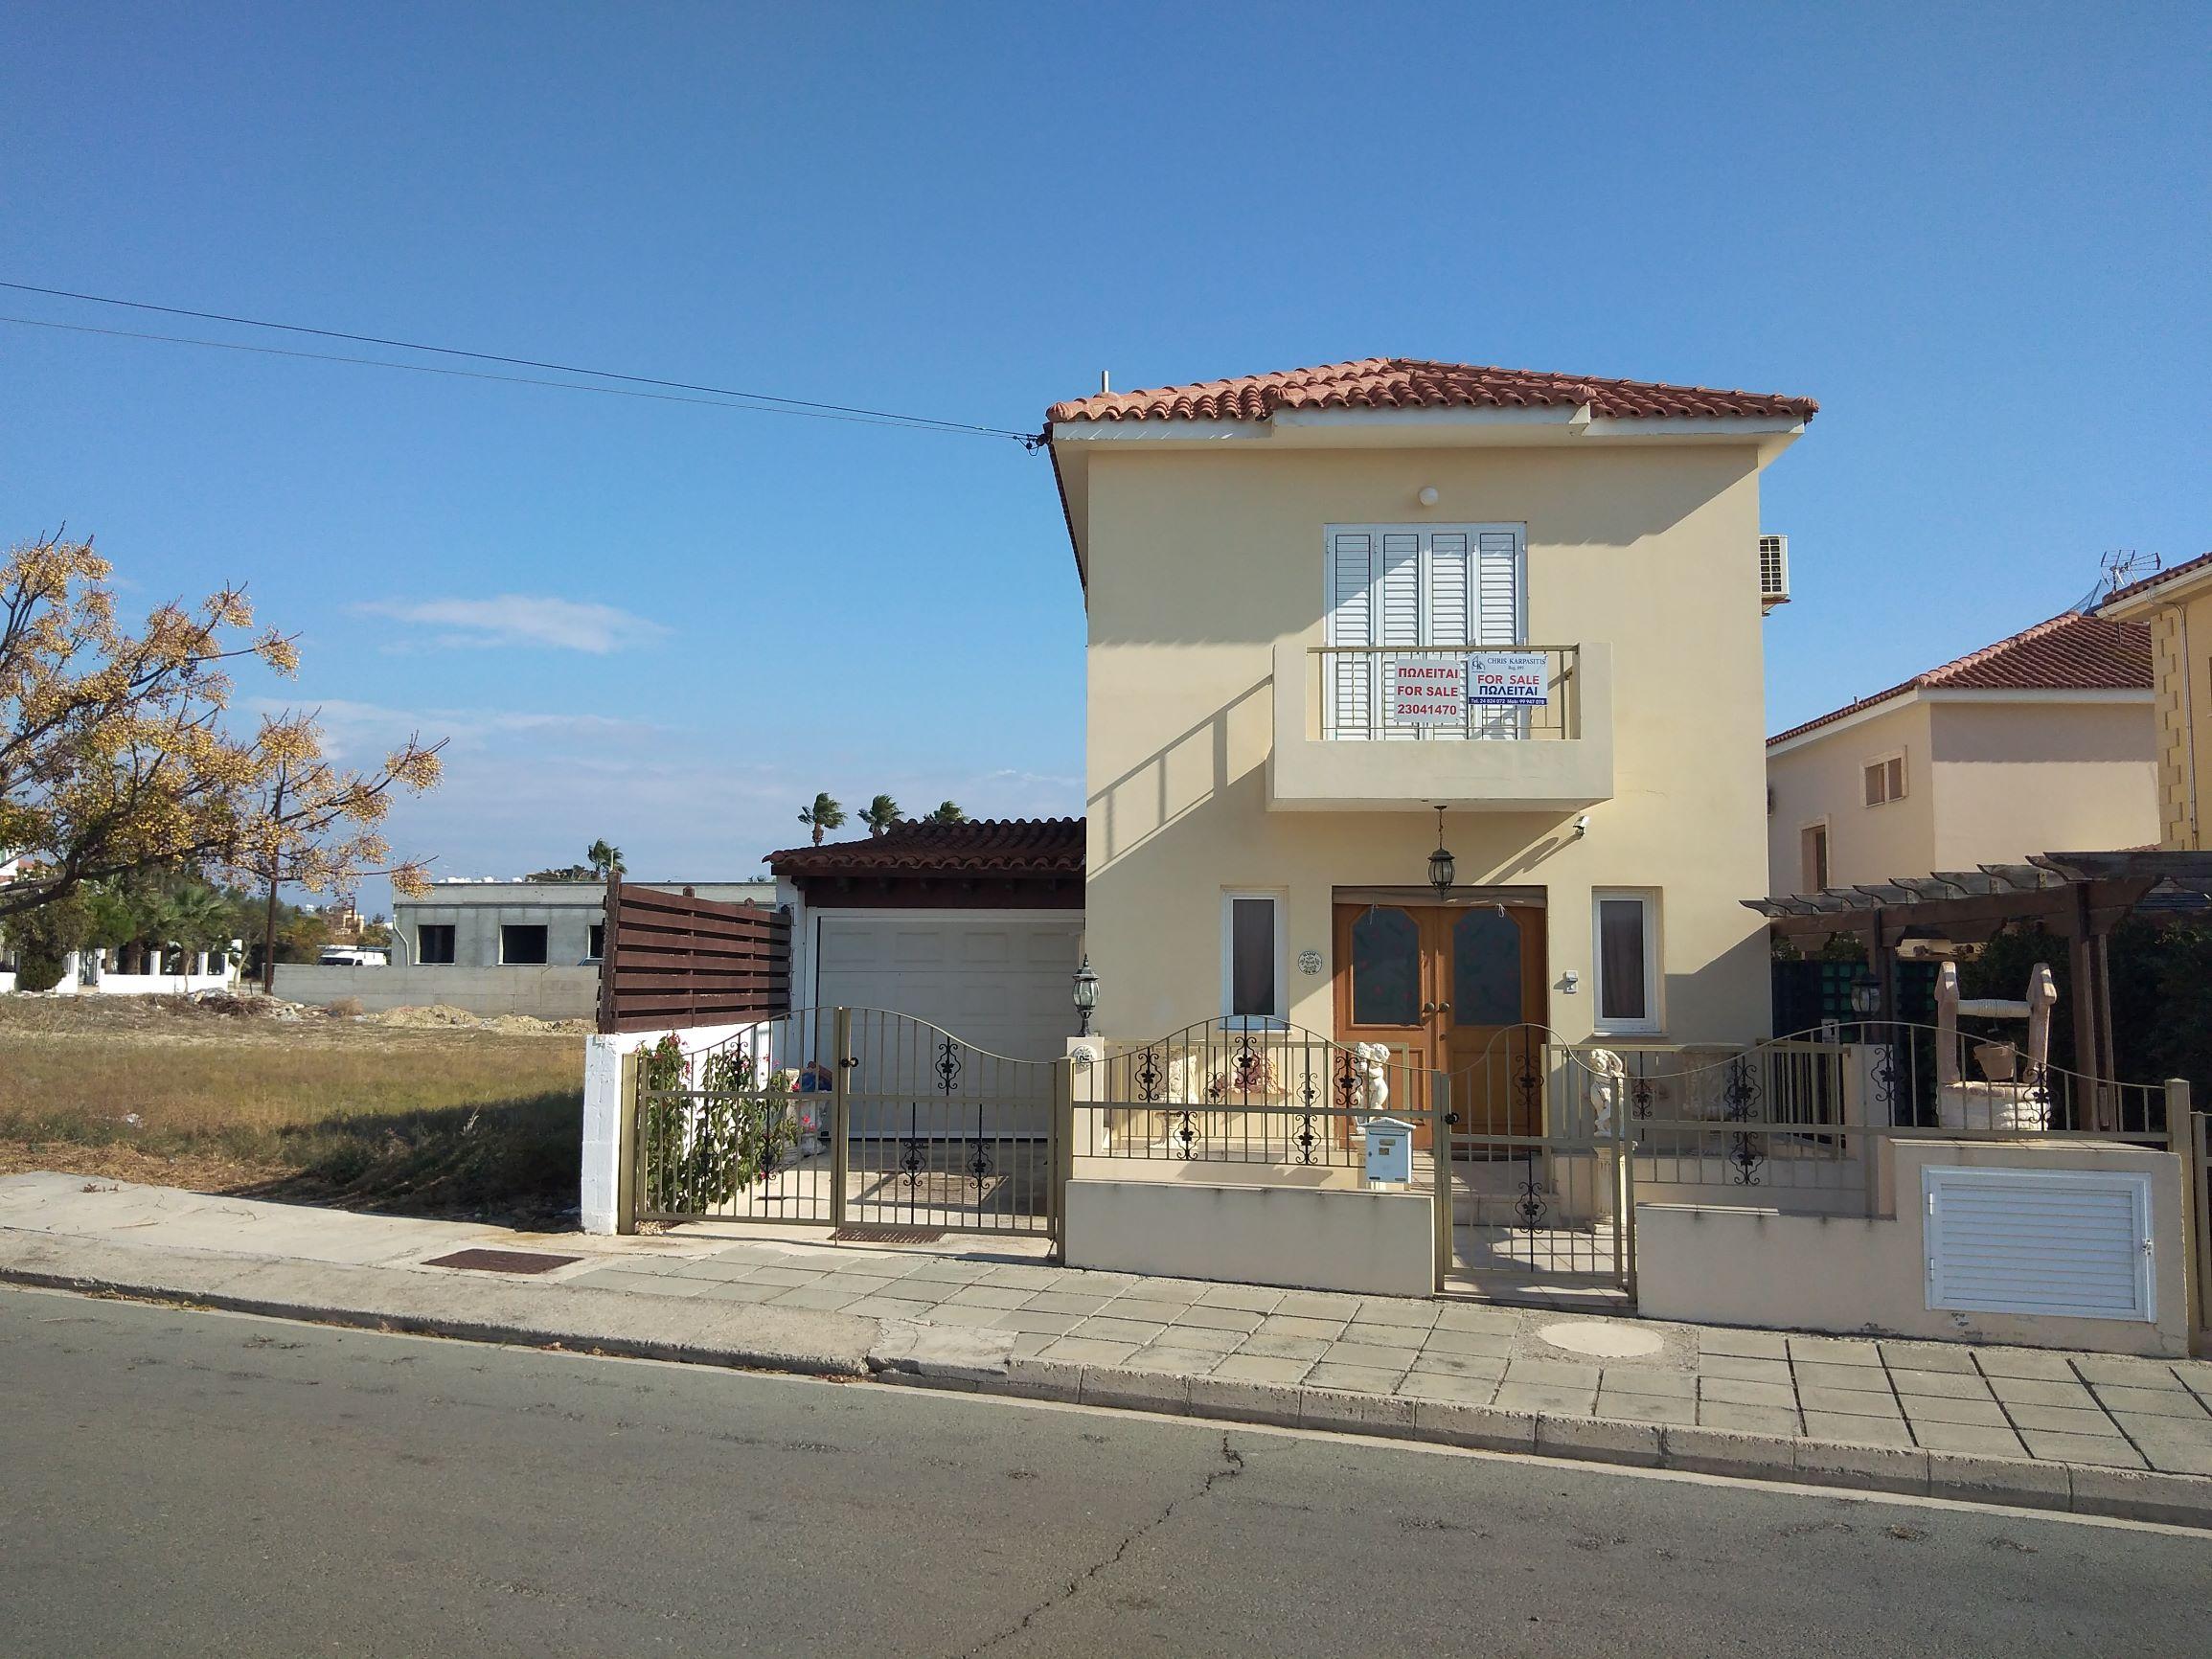 3 bedroom detached house in Oroklini.